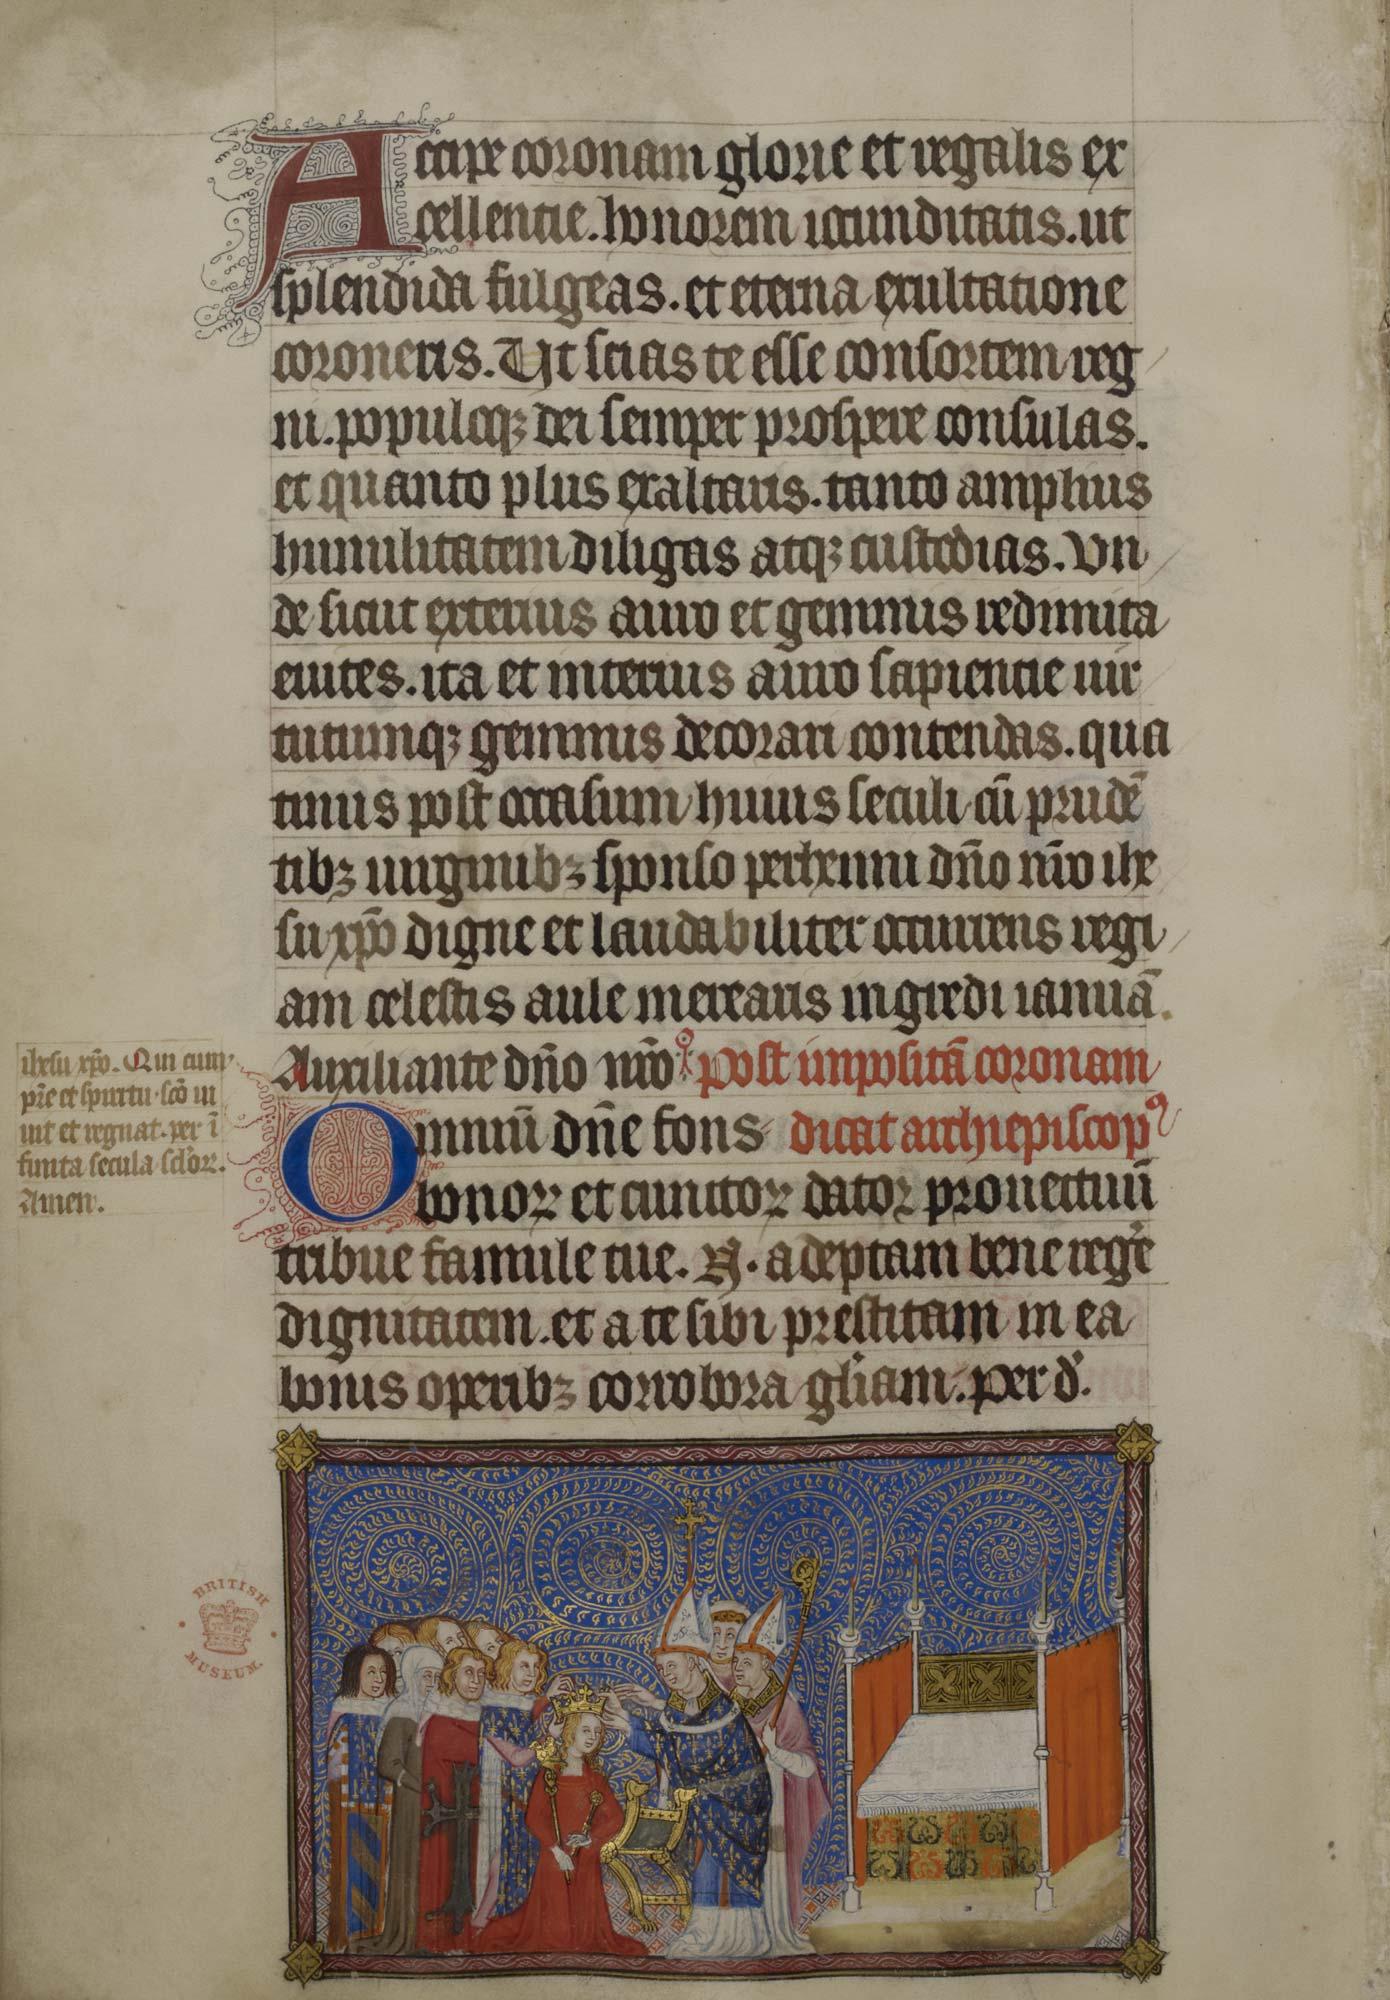 Coronation Order of Charles V, f.69